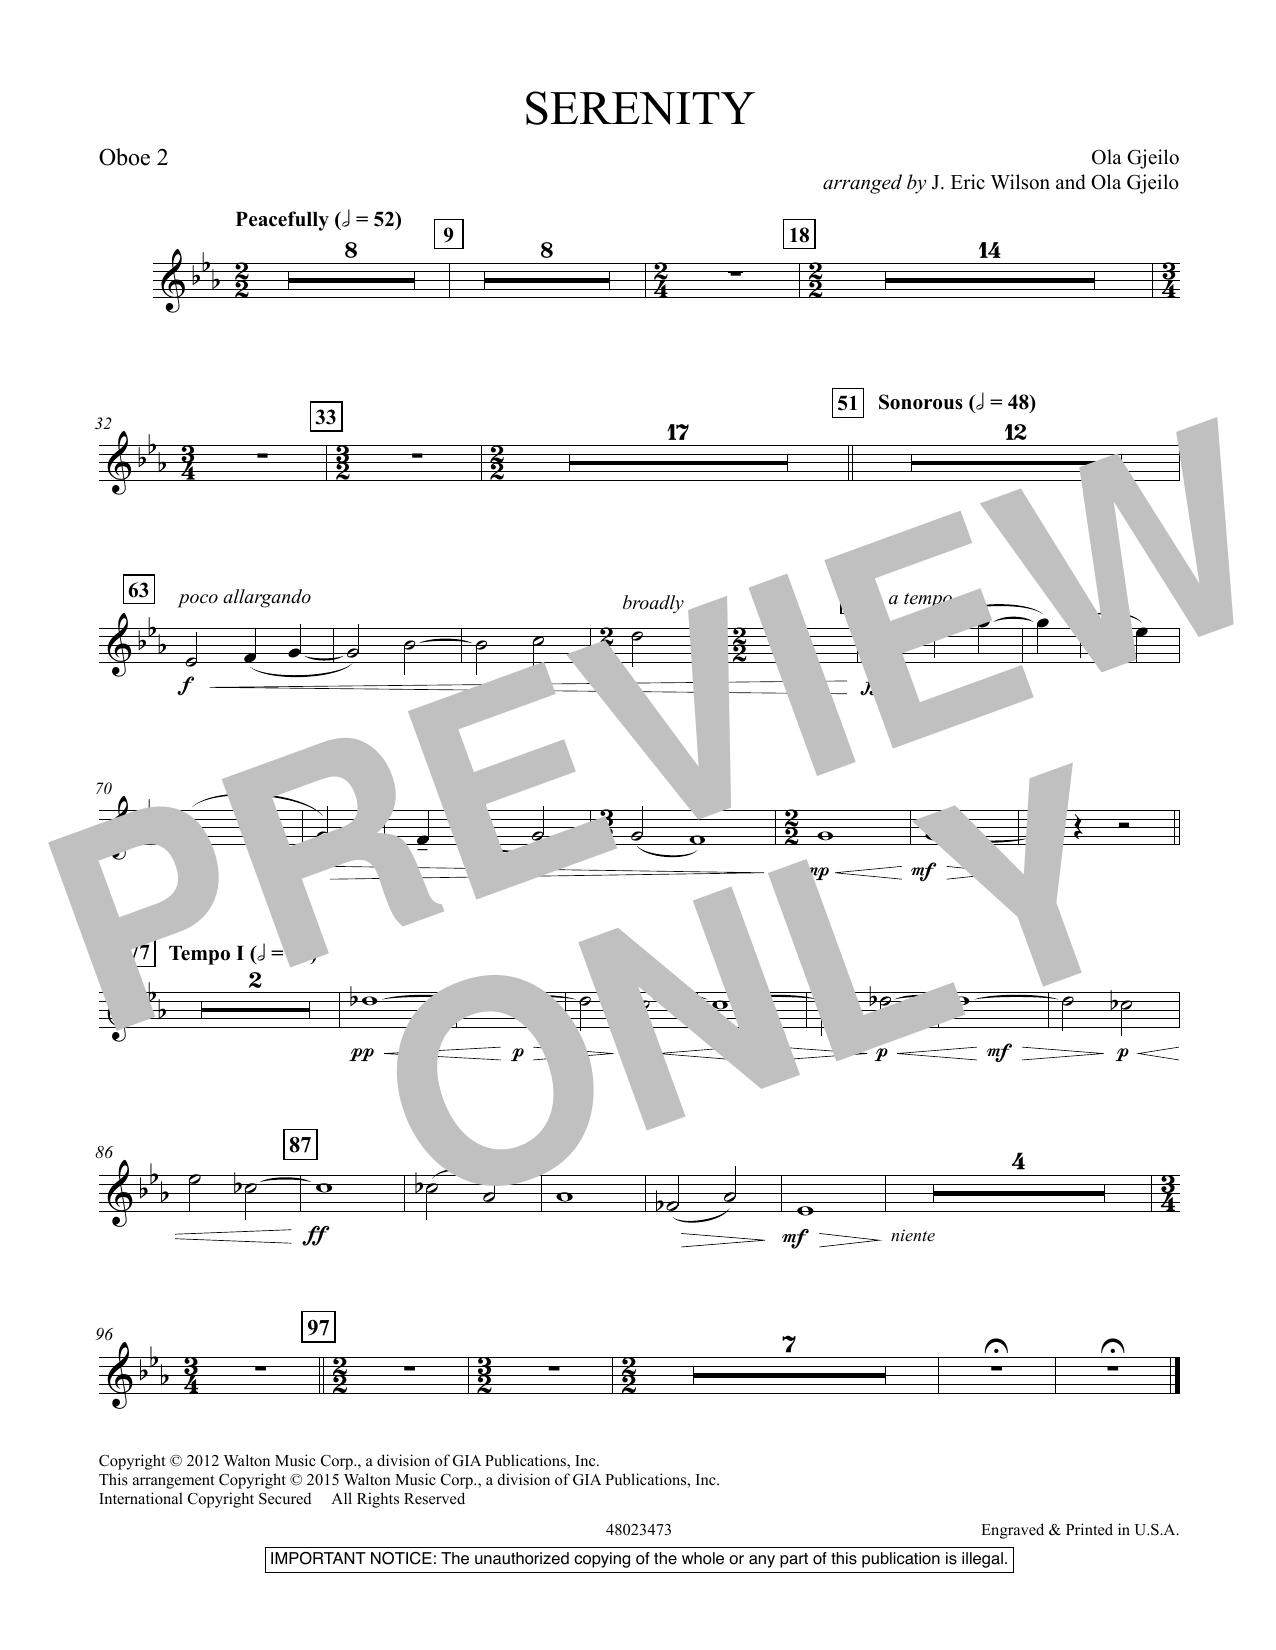 Serenity - Oboe 2 (Concert Band)